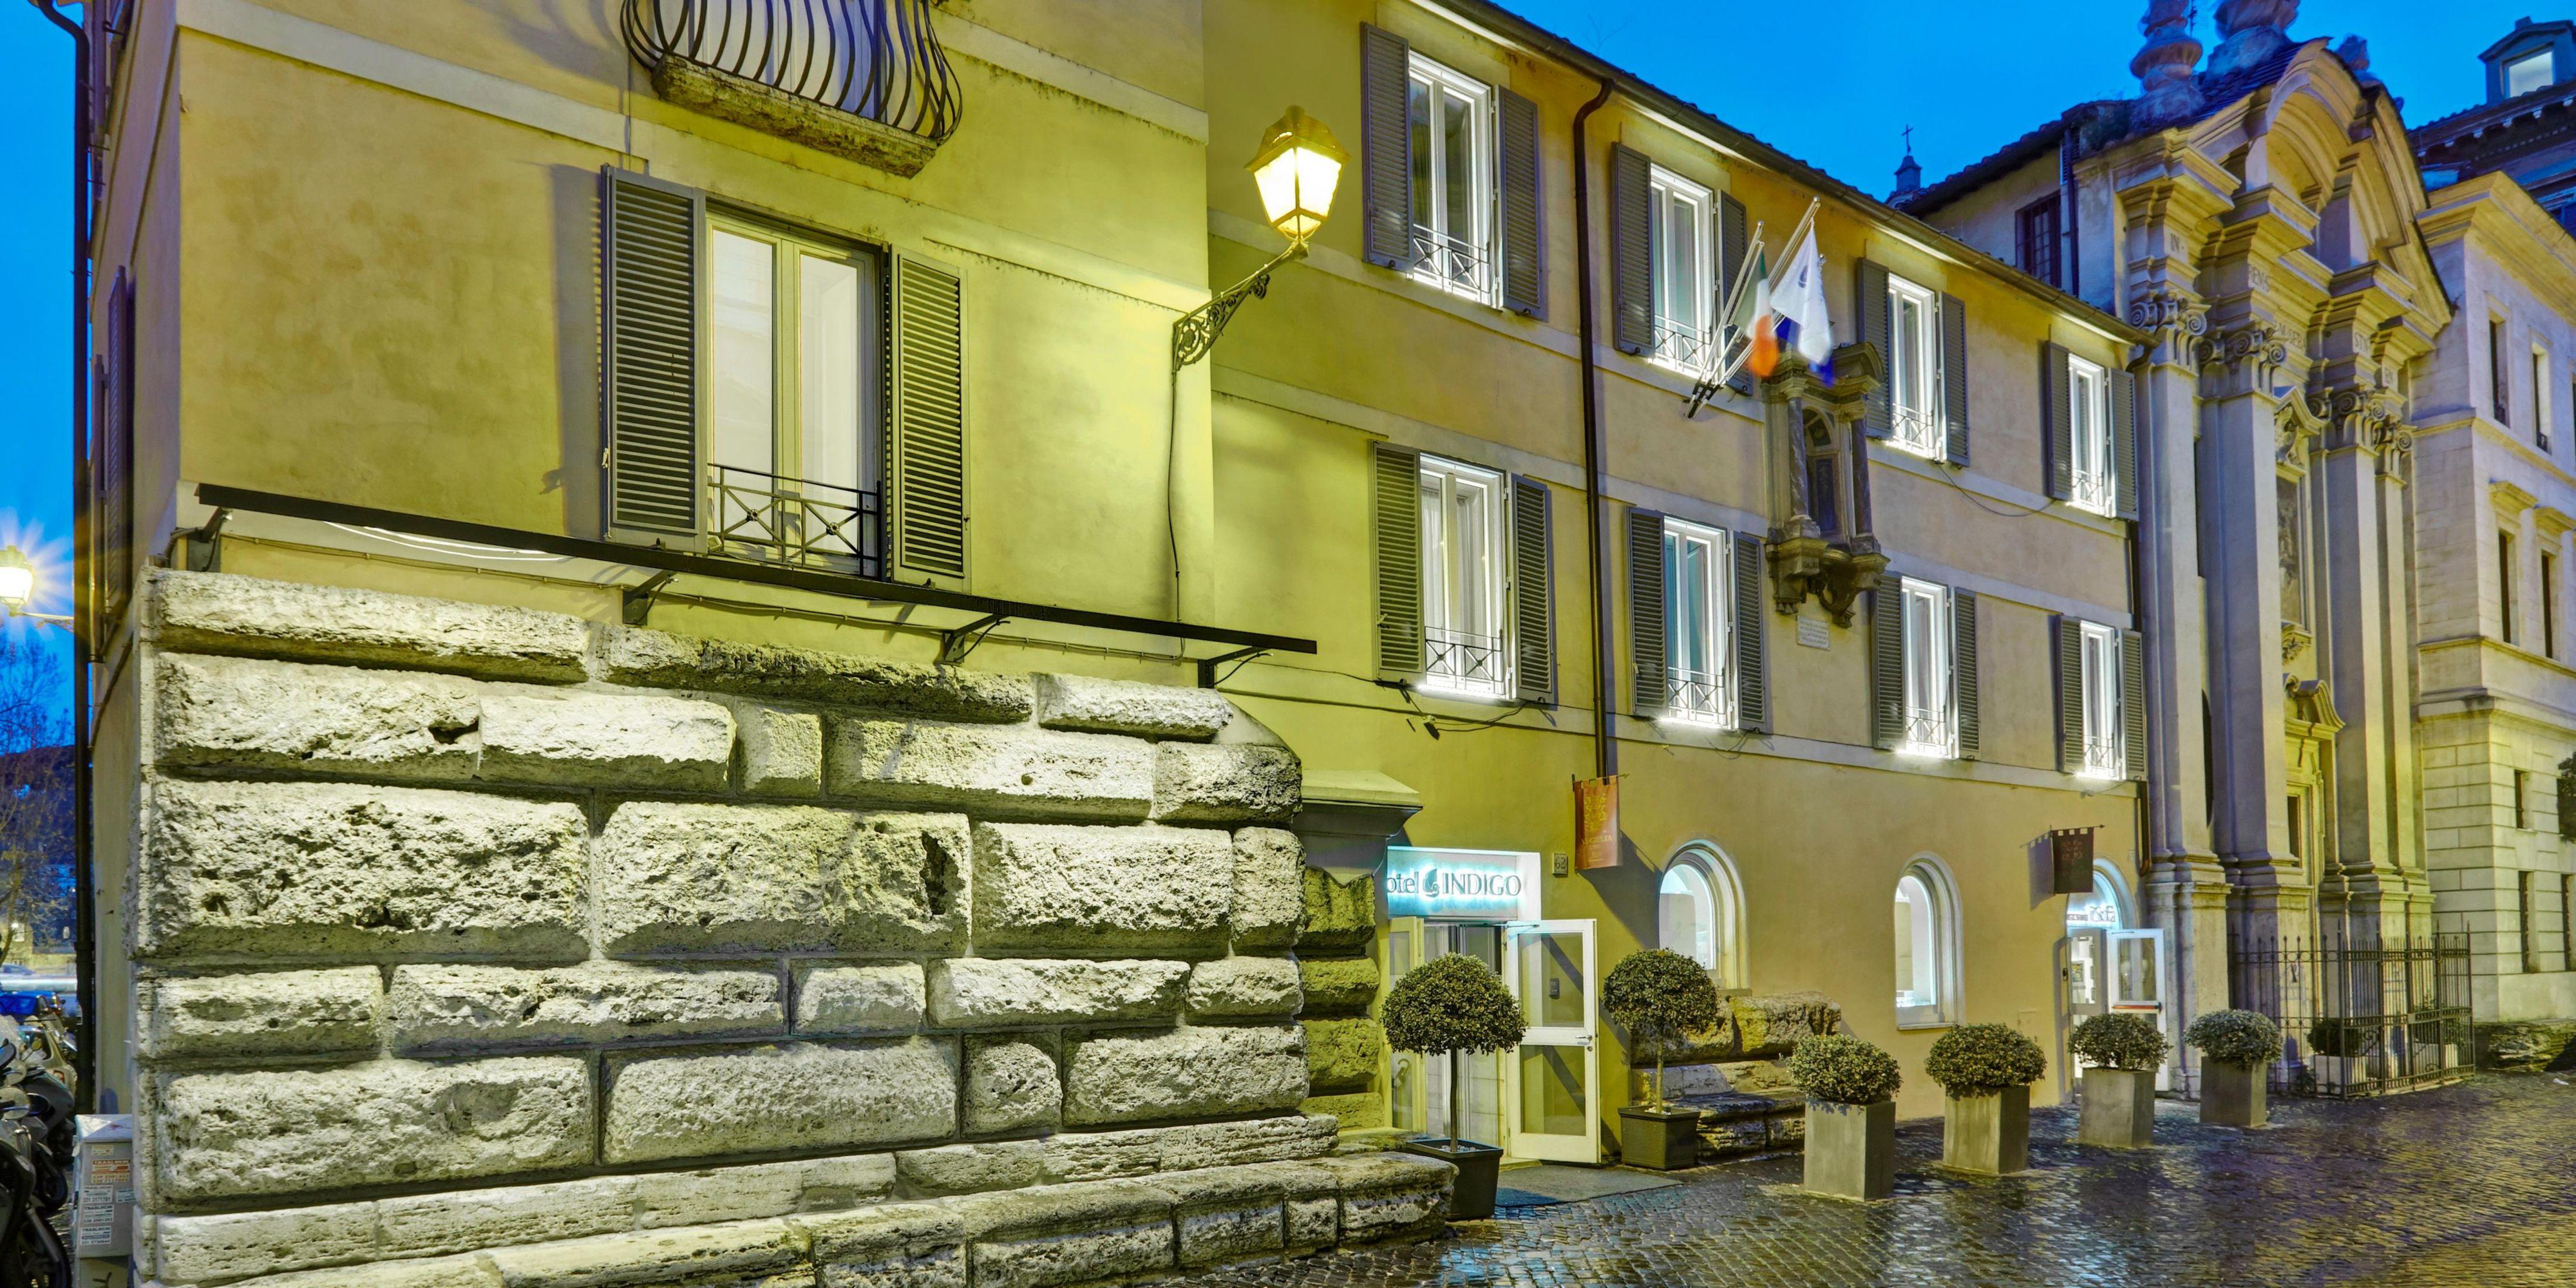 Hotel Indigo Rome St George Rome Italie